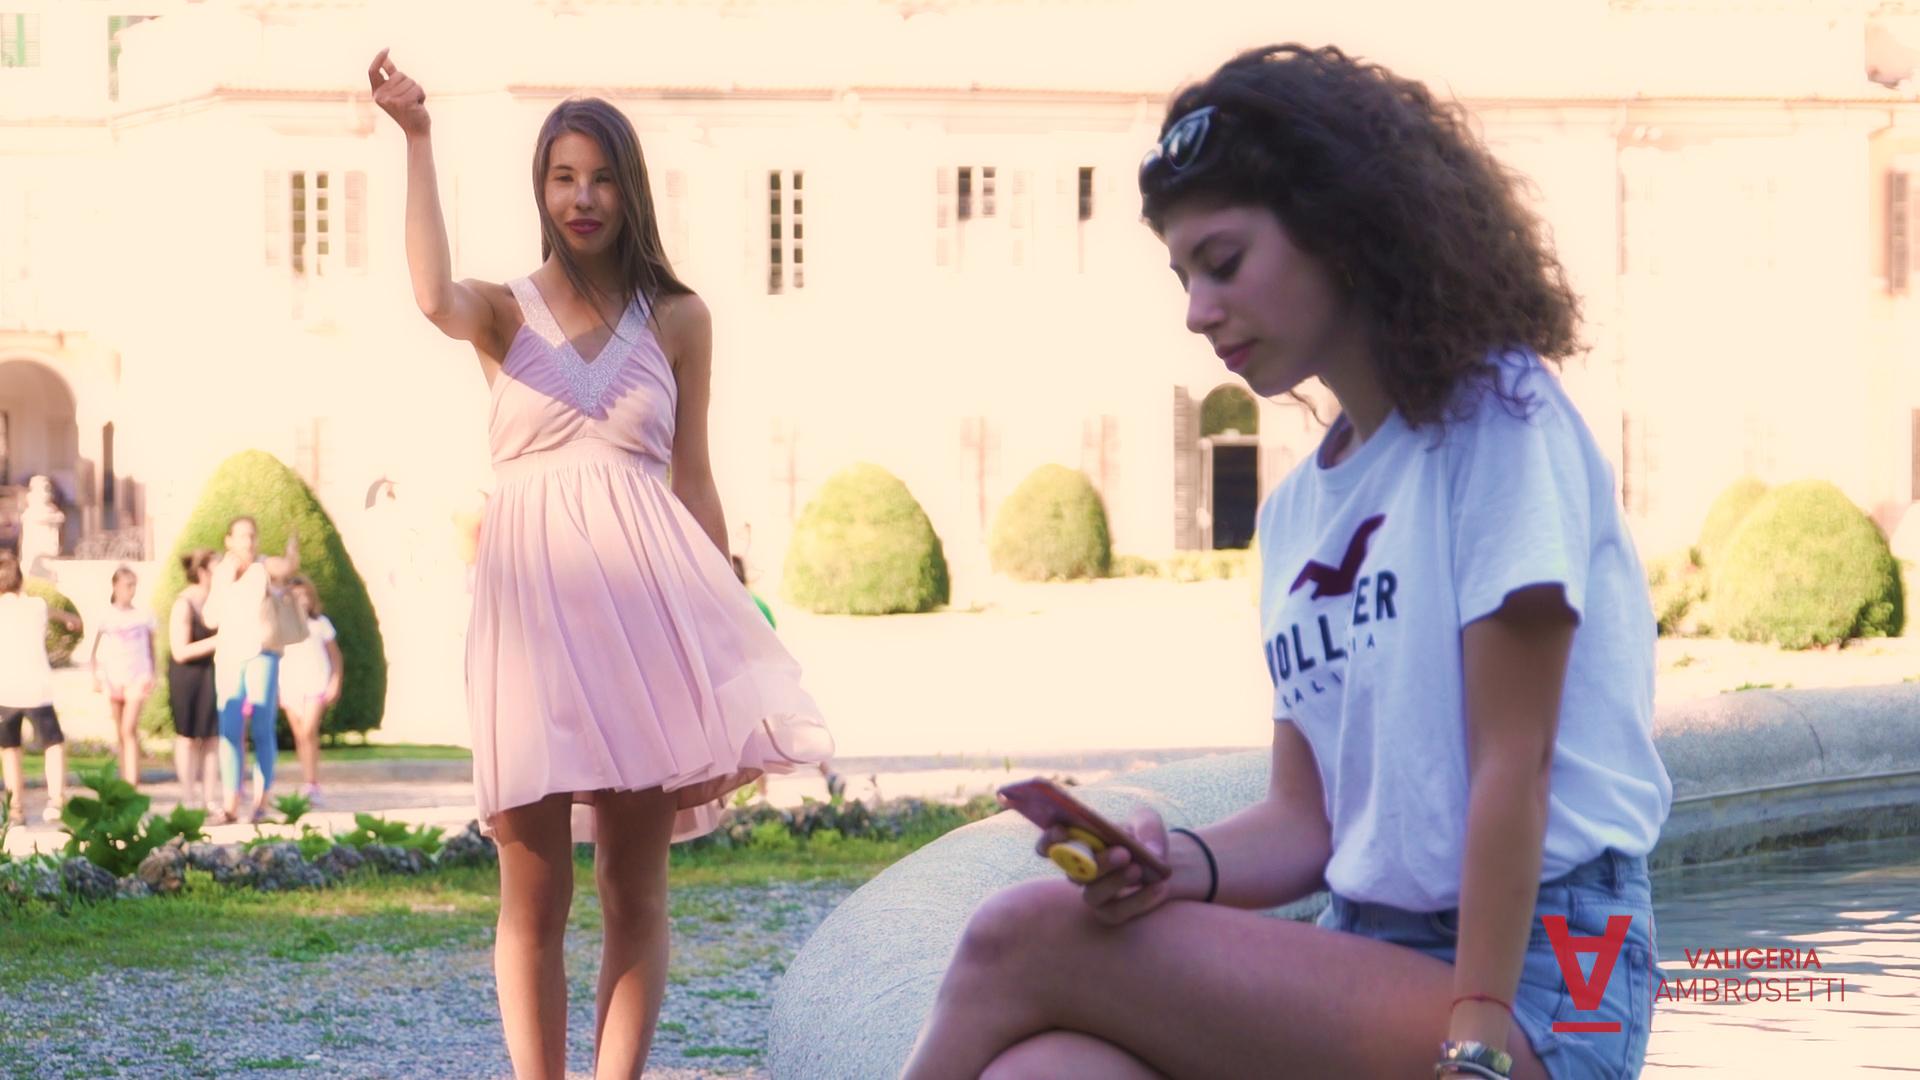 saldi-estivi-2018-Valigeria-ambrosetti